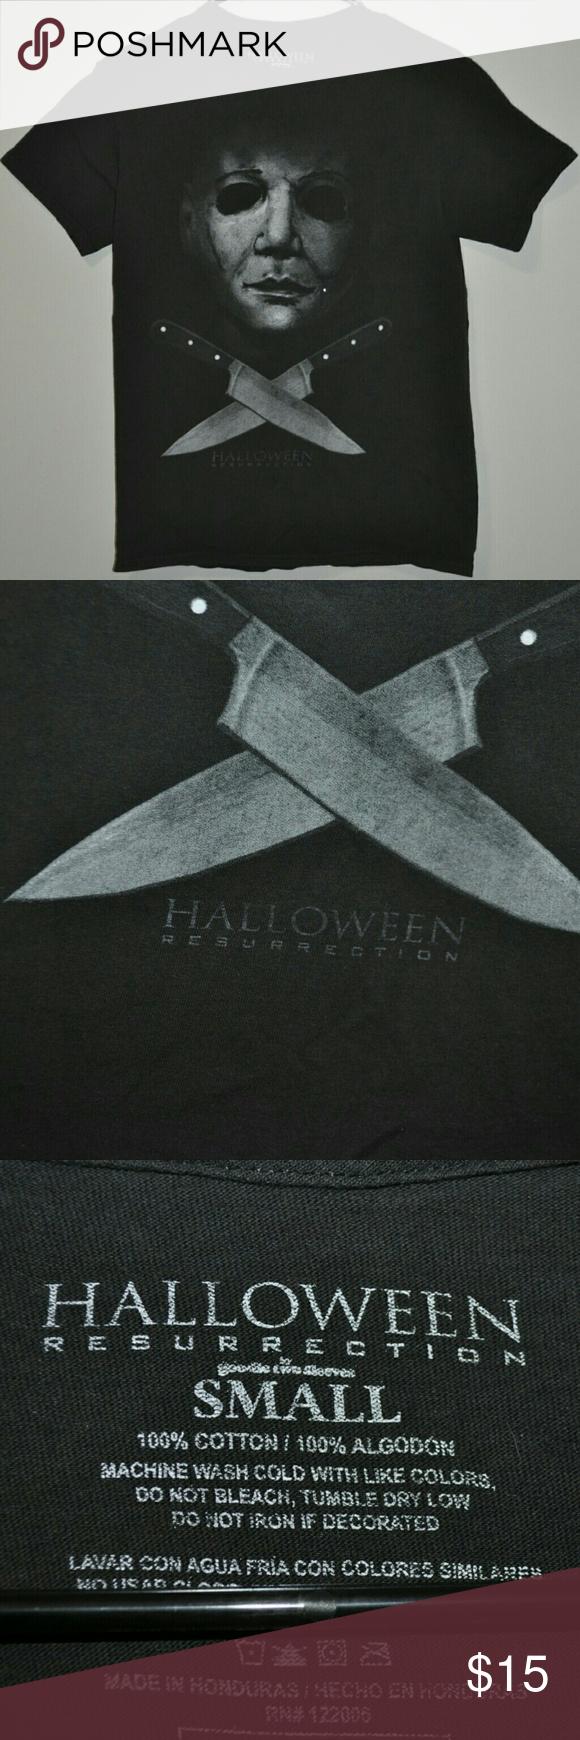 Halloween Resurrection T Shirt Film Tshirt Halloween Resurrection T Shirt